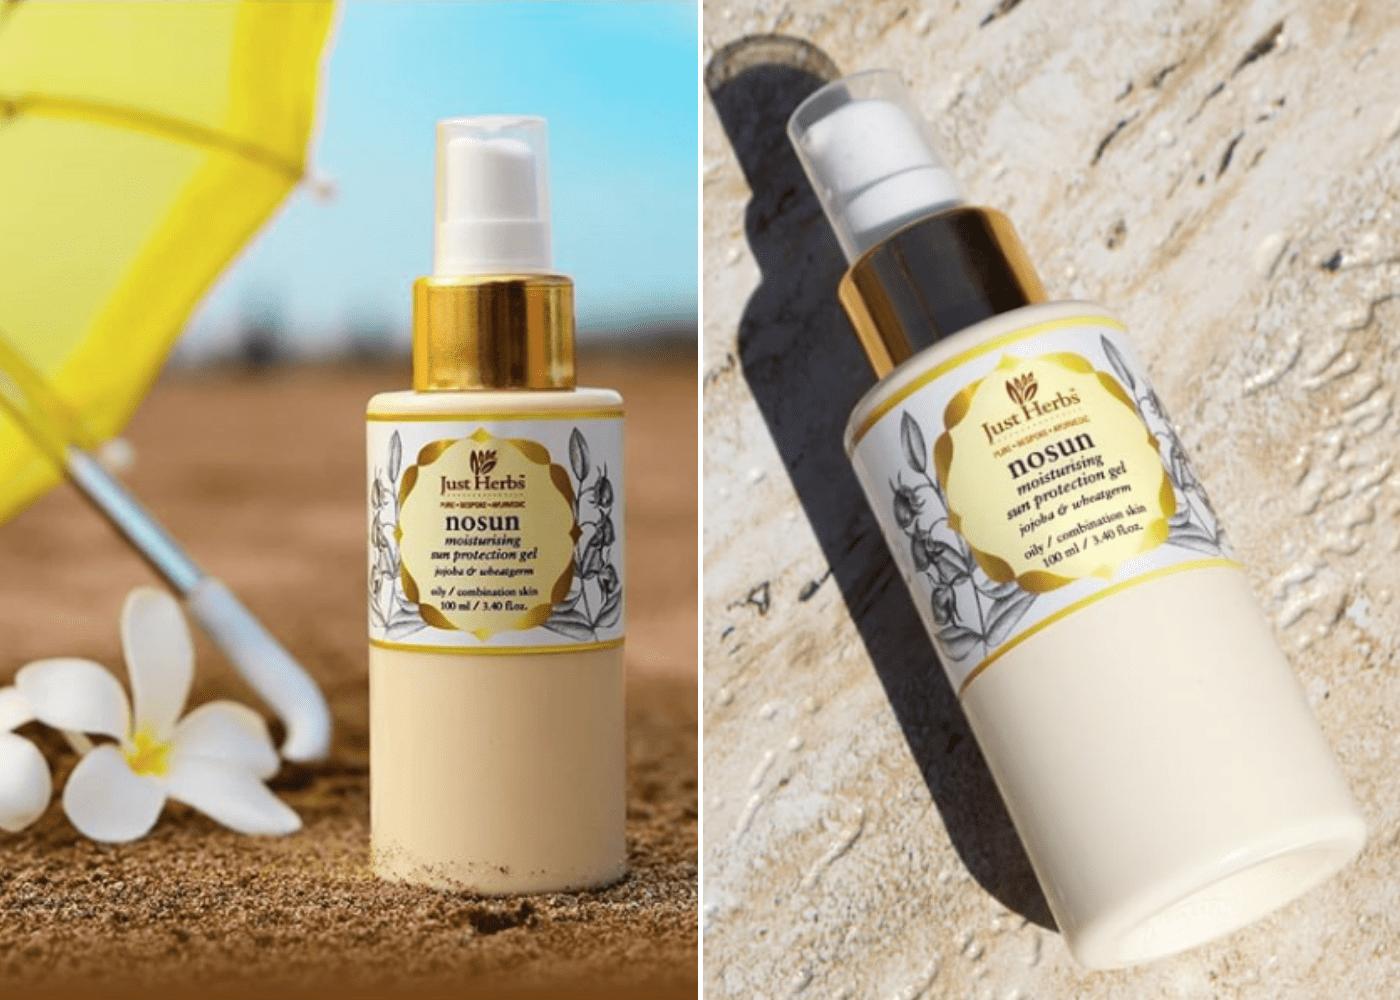 Just Herbs No Sun Jojoba-Wheatgerm Moisturising Sun Protection Gel | Best sunscreens